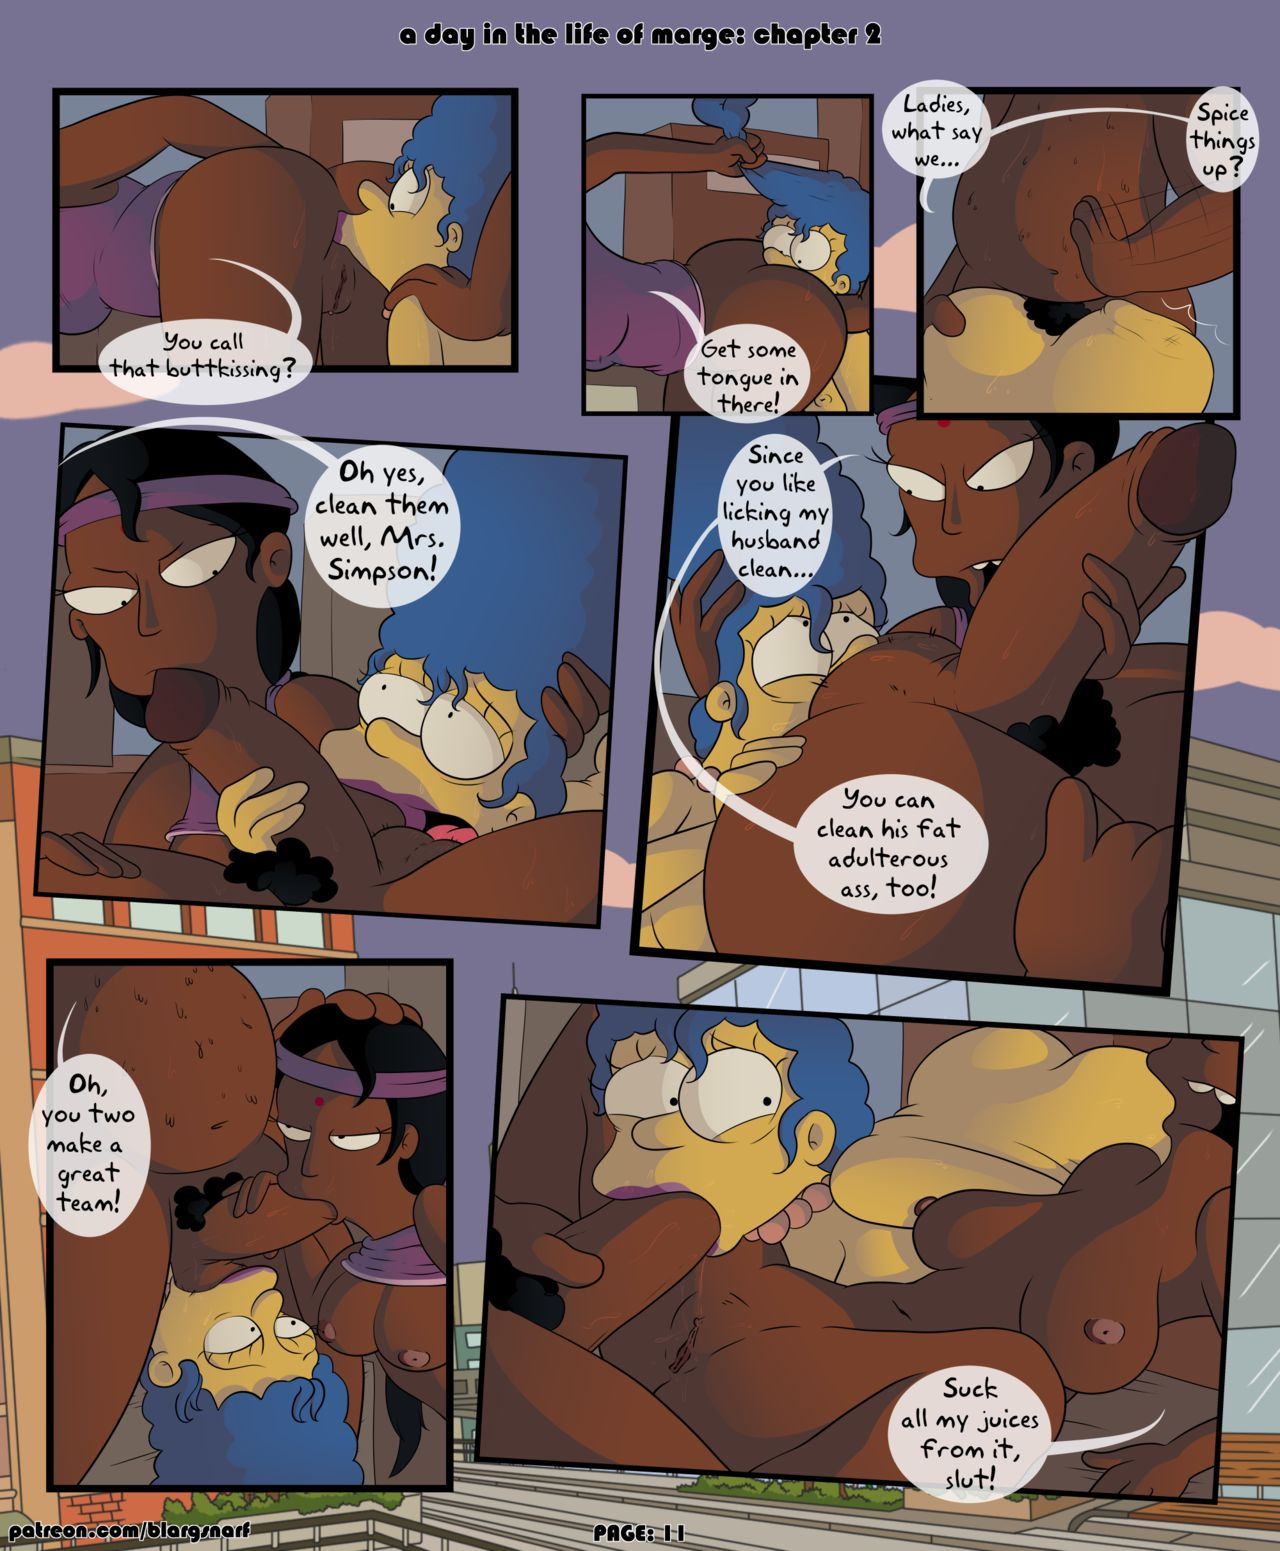 Free porn Simpsons galleries Page 1 - ImageFap